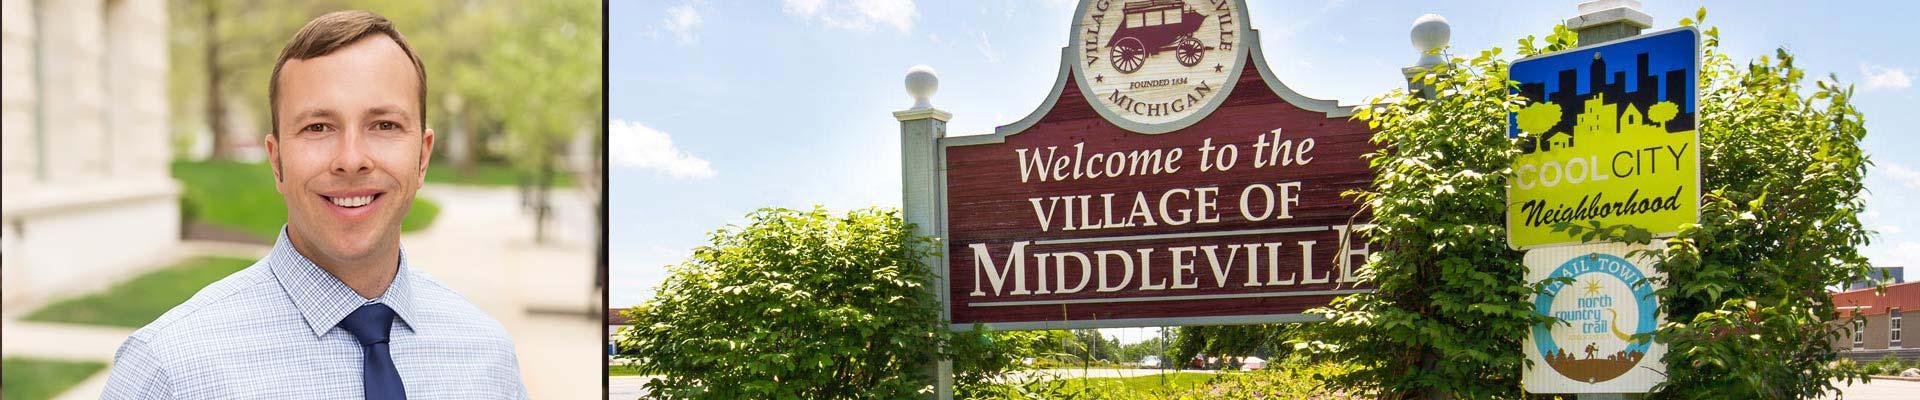 buy-a-home-in-middleville-mi-dave-kiel-realtor-at-blueprint-properties